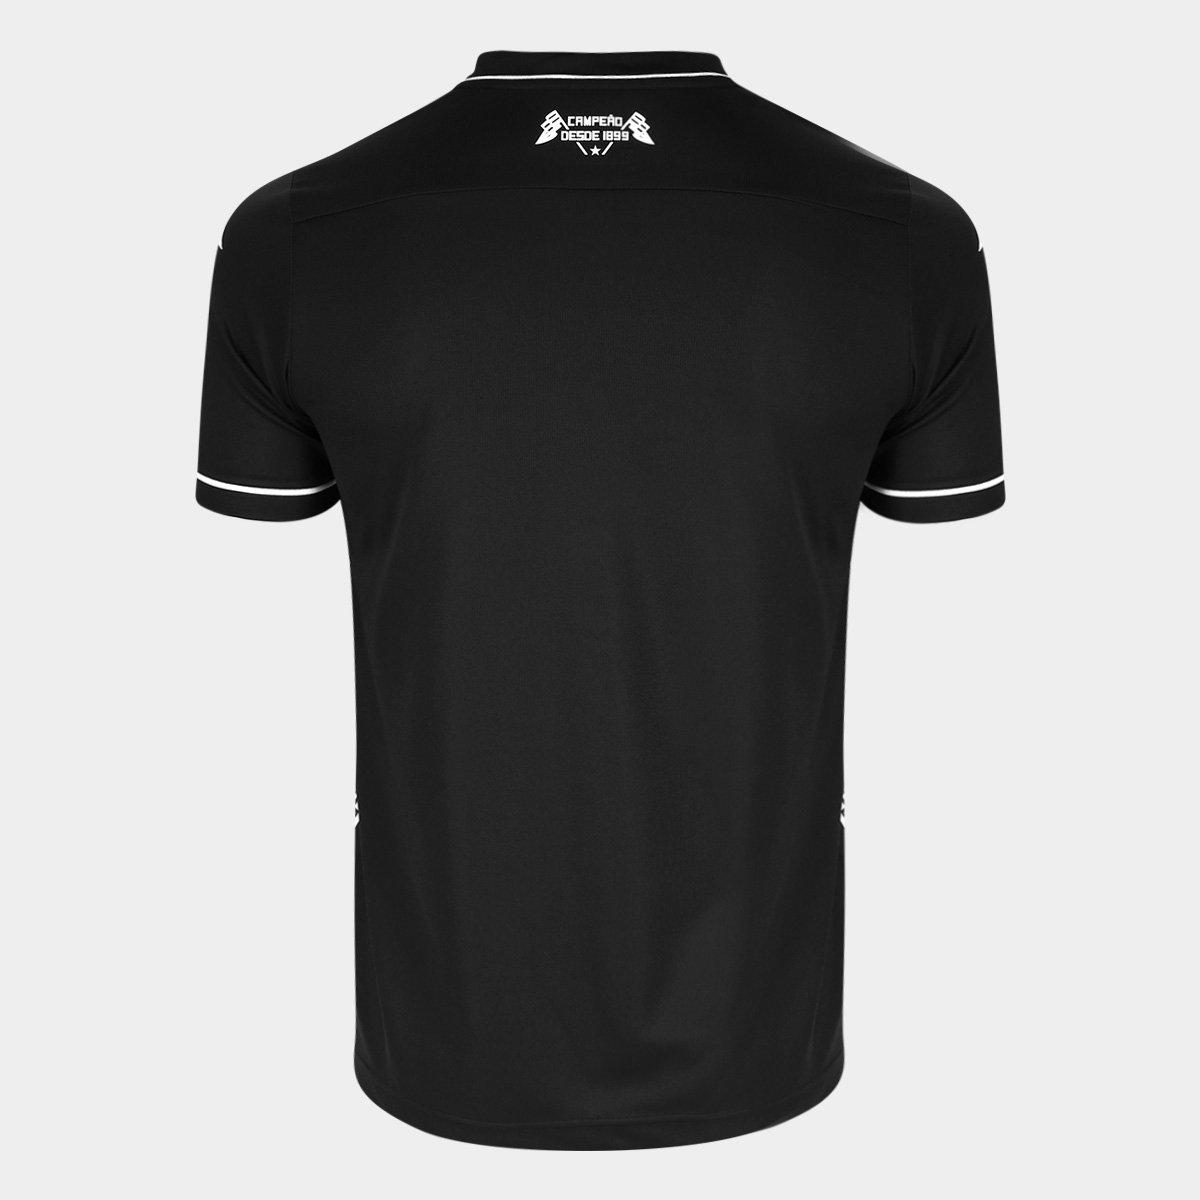 Camisa Kappa Botafogo Jogo 2 - 19/20